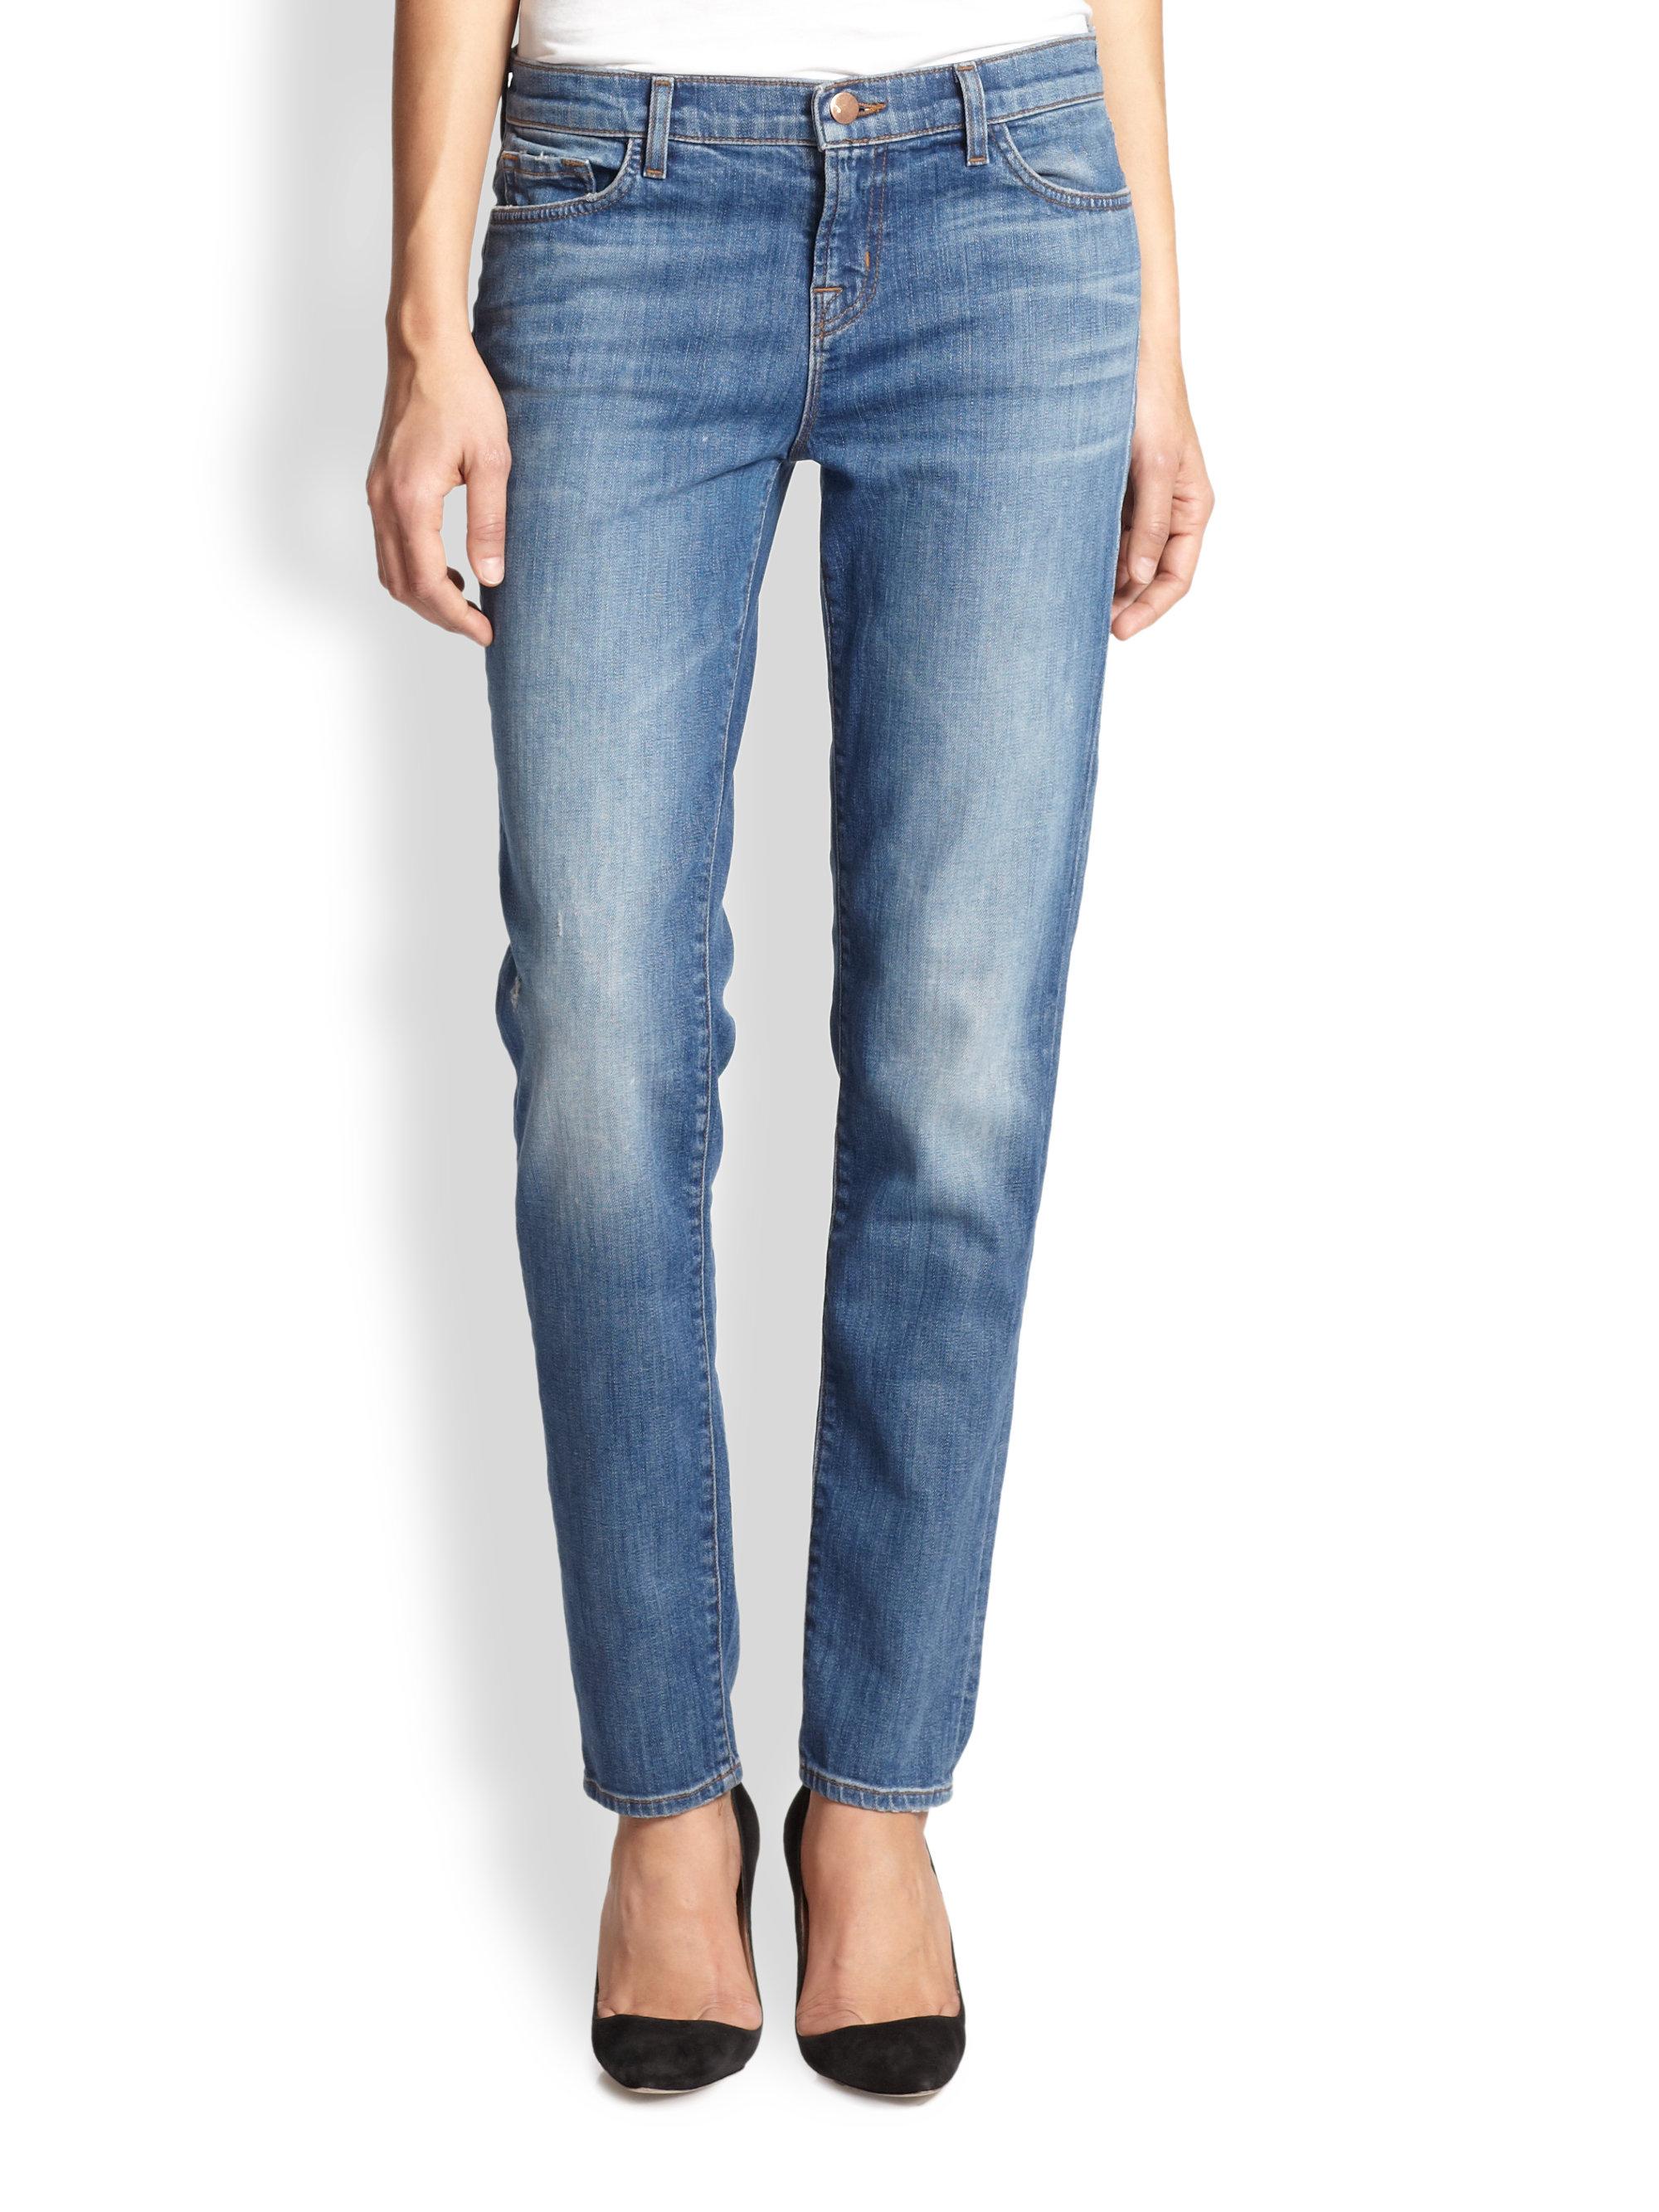 j brand mid rise skinny jeans review super jeans in. Black Bedroom Furniture Sets. Home Design Ideas